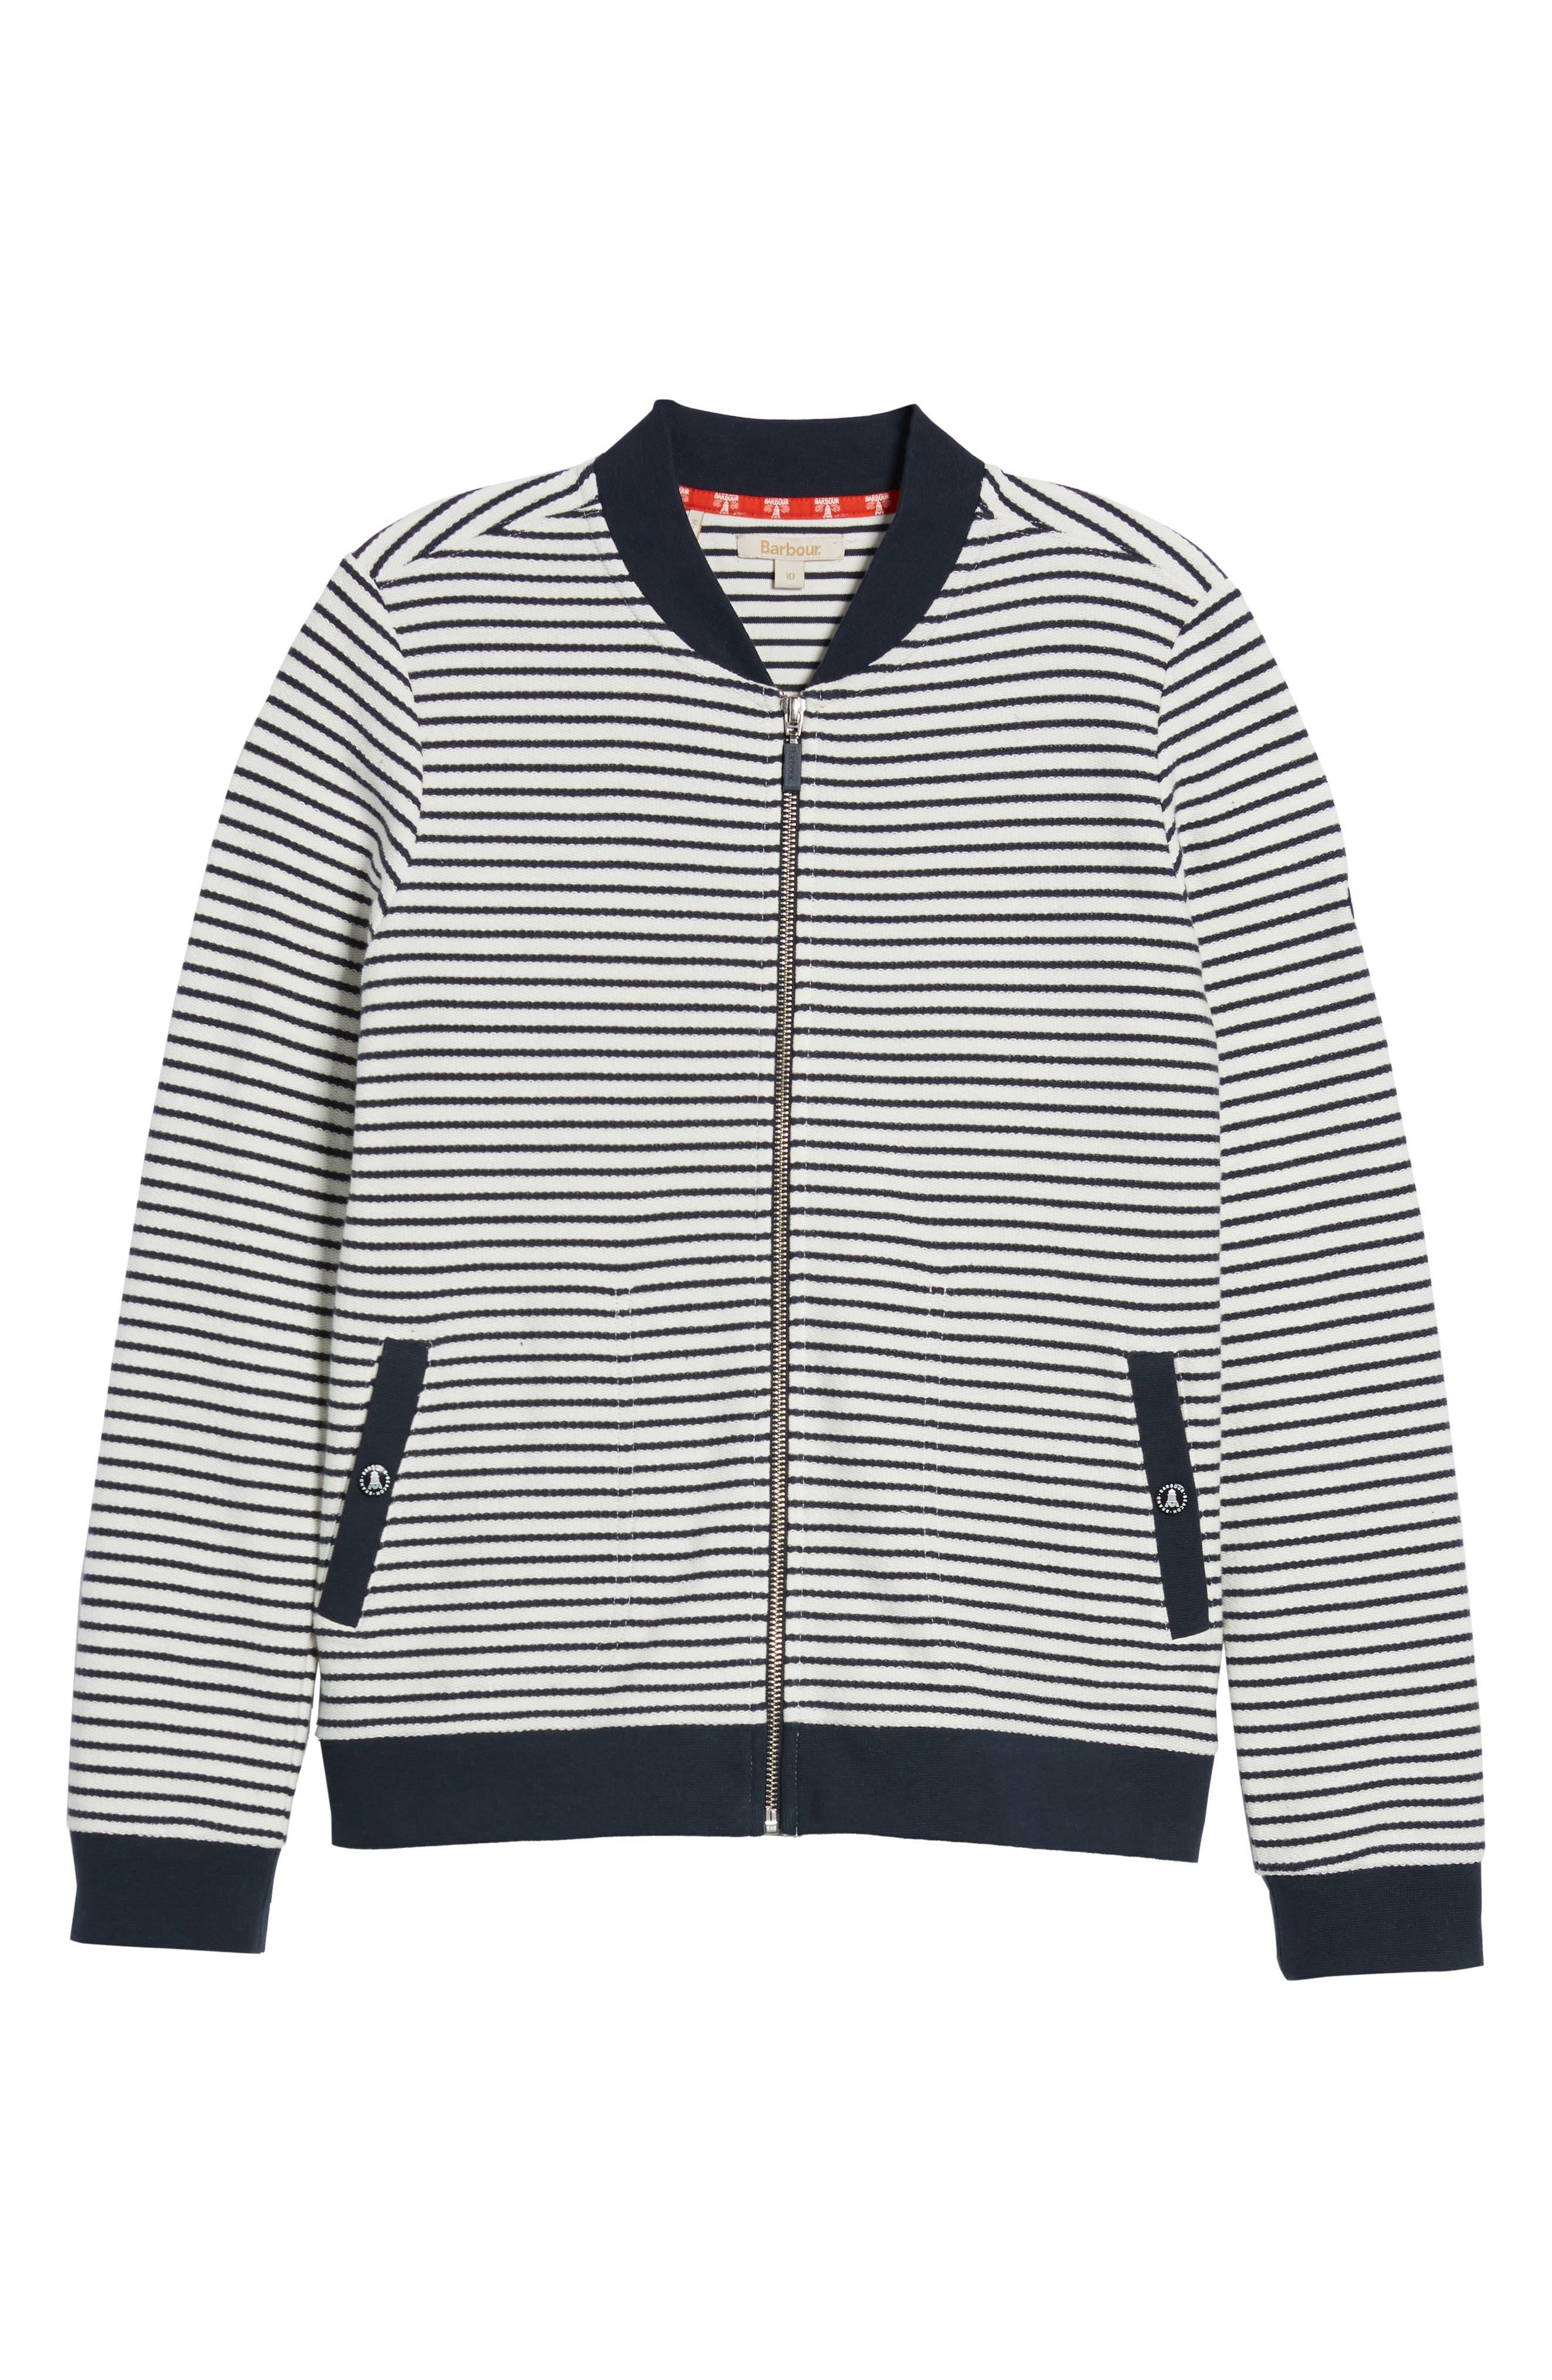 Bamburgh Sweater Jacket,                             Alternate thumbnail 11, color,